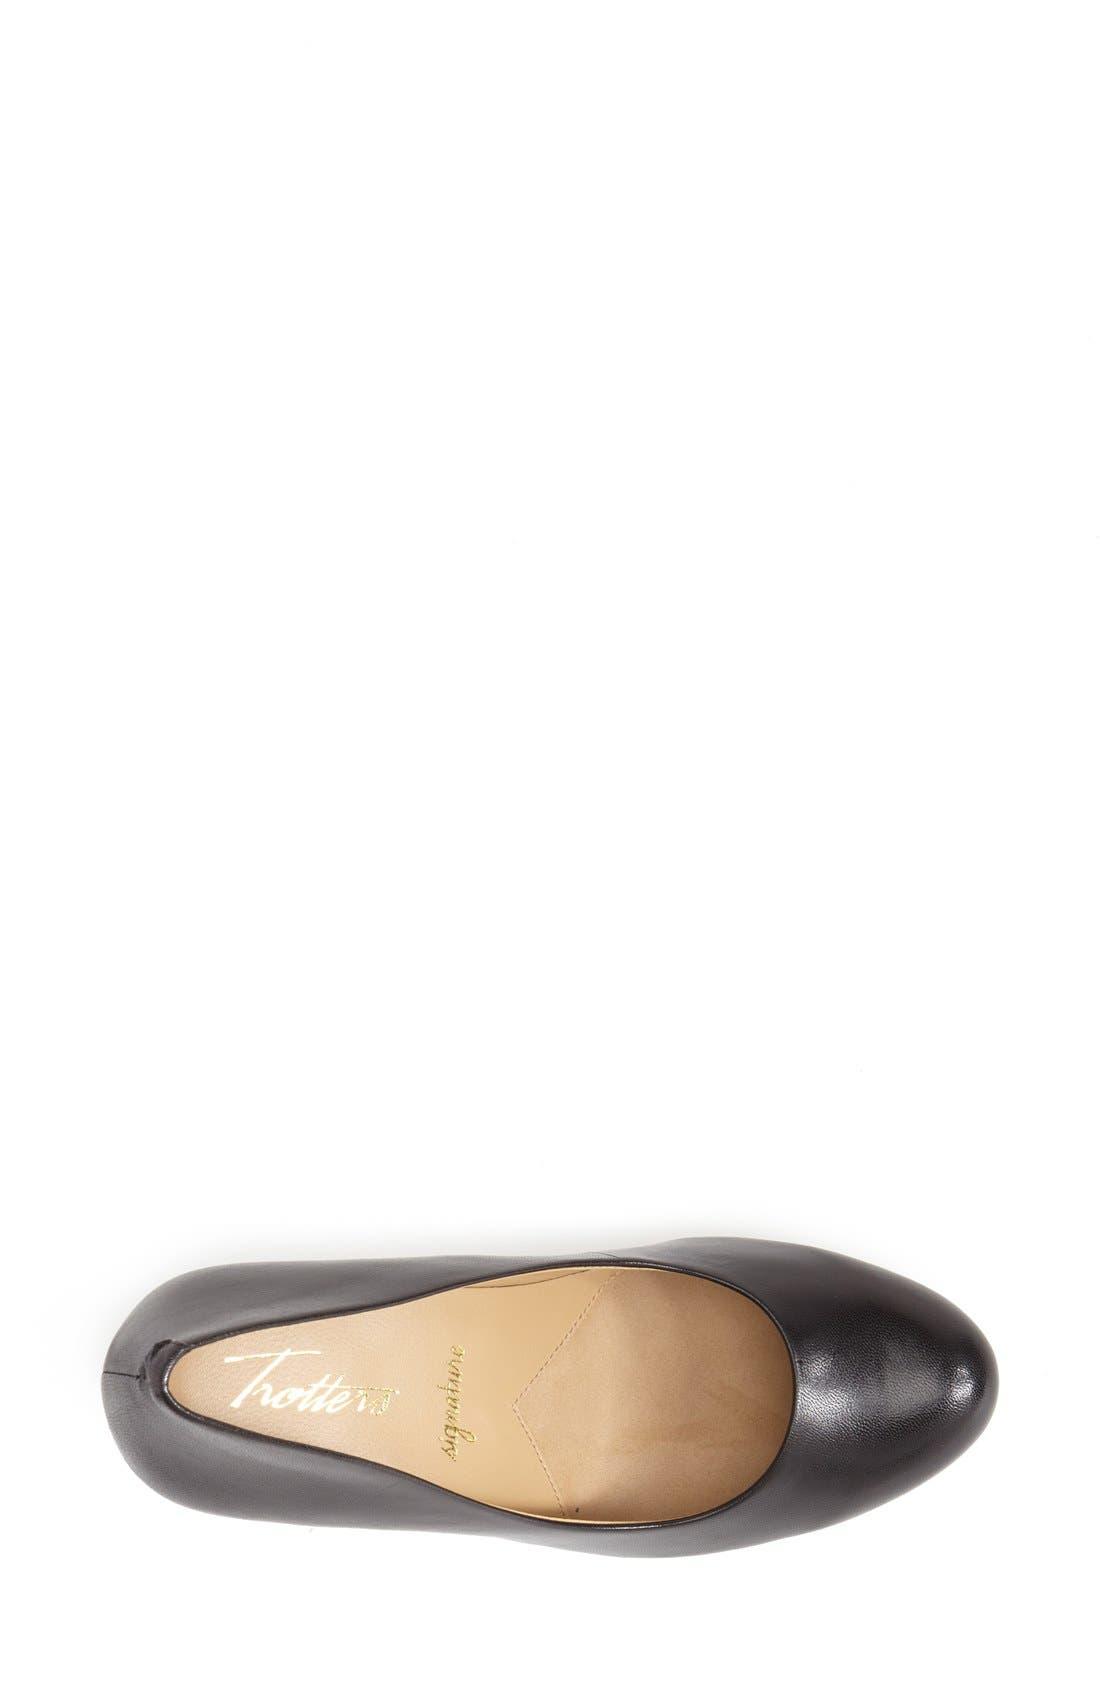 'Signature Gigi' Round Toe Pump,                             Alternate thumbnail 4, color,                             BLACK